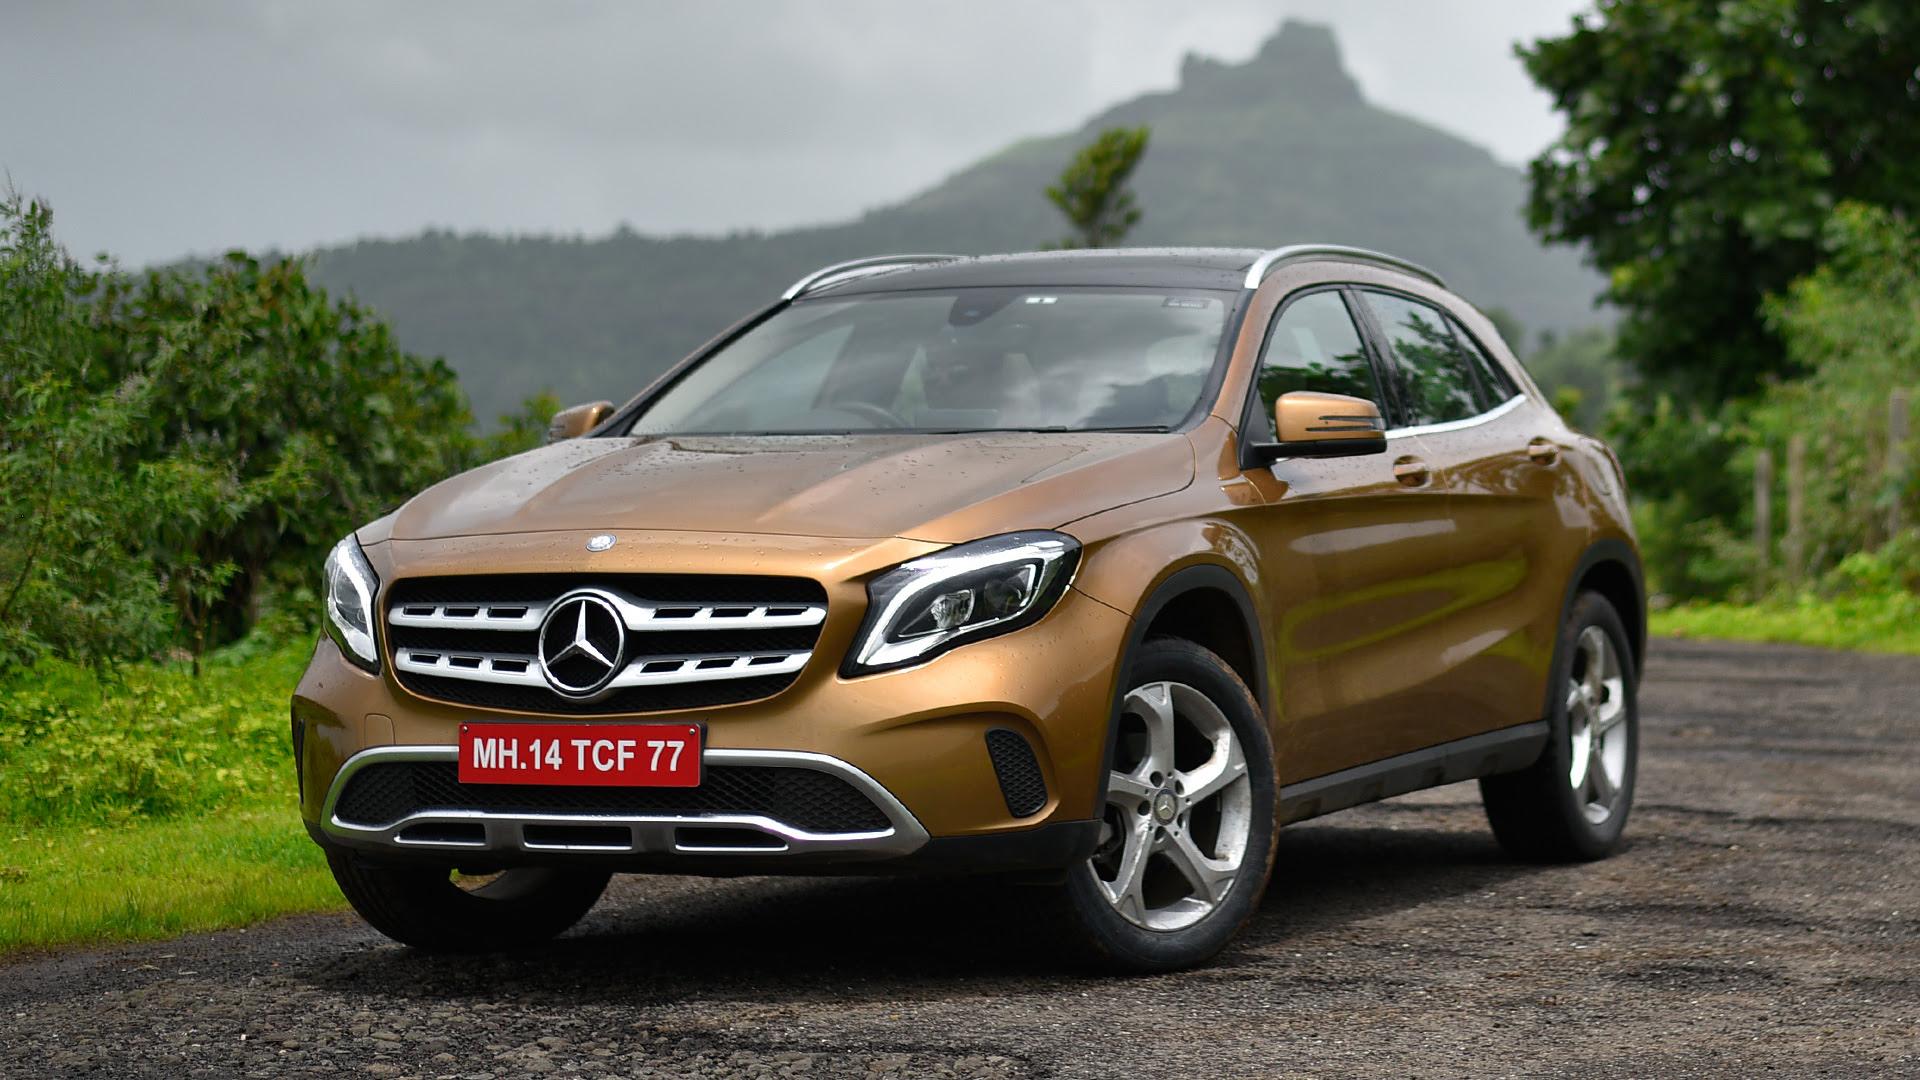 Mercedes-Benz GLA 2018 - Price, Mileage, Reviews ...